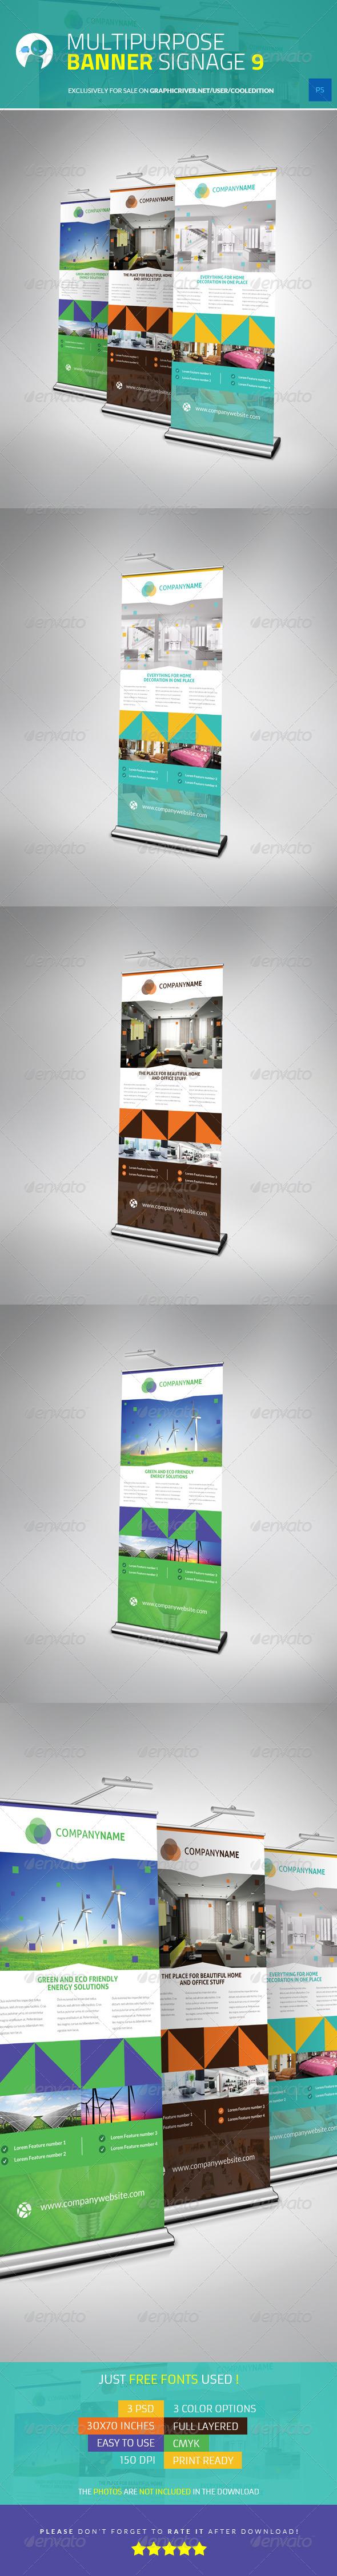 Multipurpose Banner Signage 9 - Print Templates